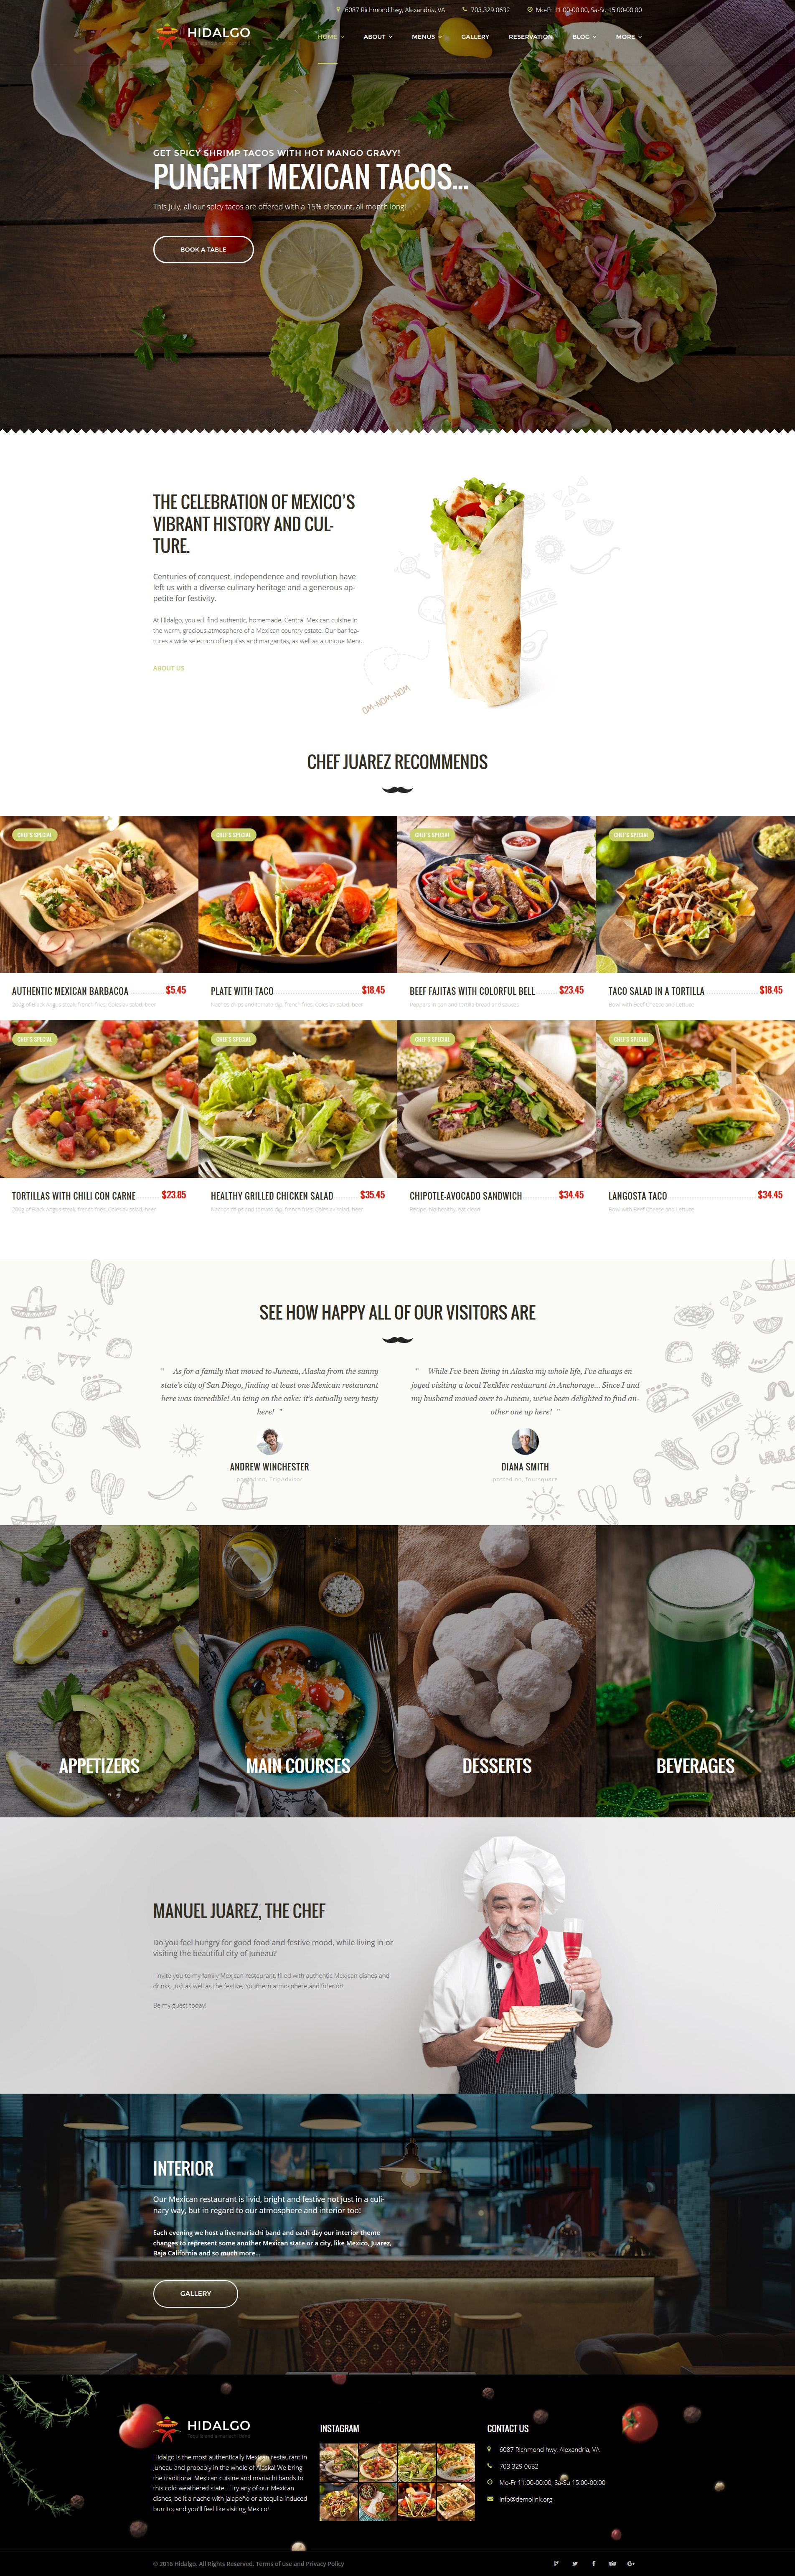 """Hidalgo - Mexican Food Restaurant"" - адаптивний WordPress шаблон №59006"